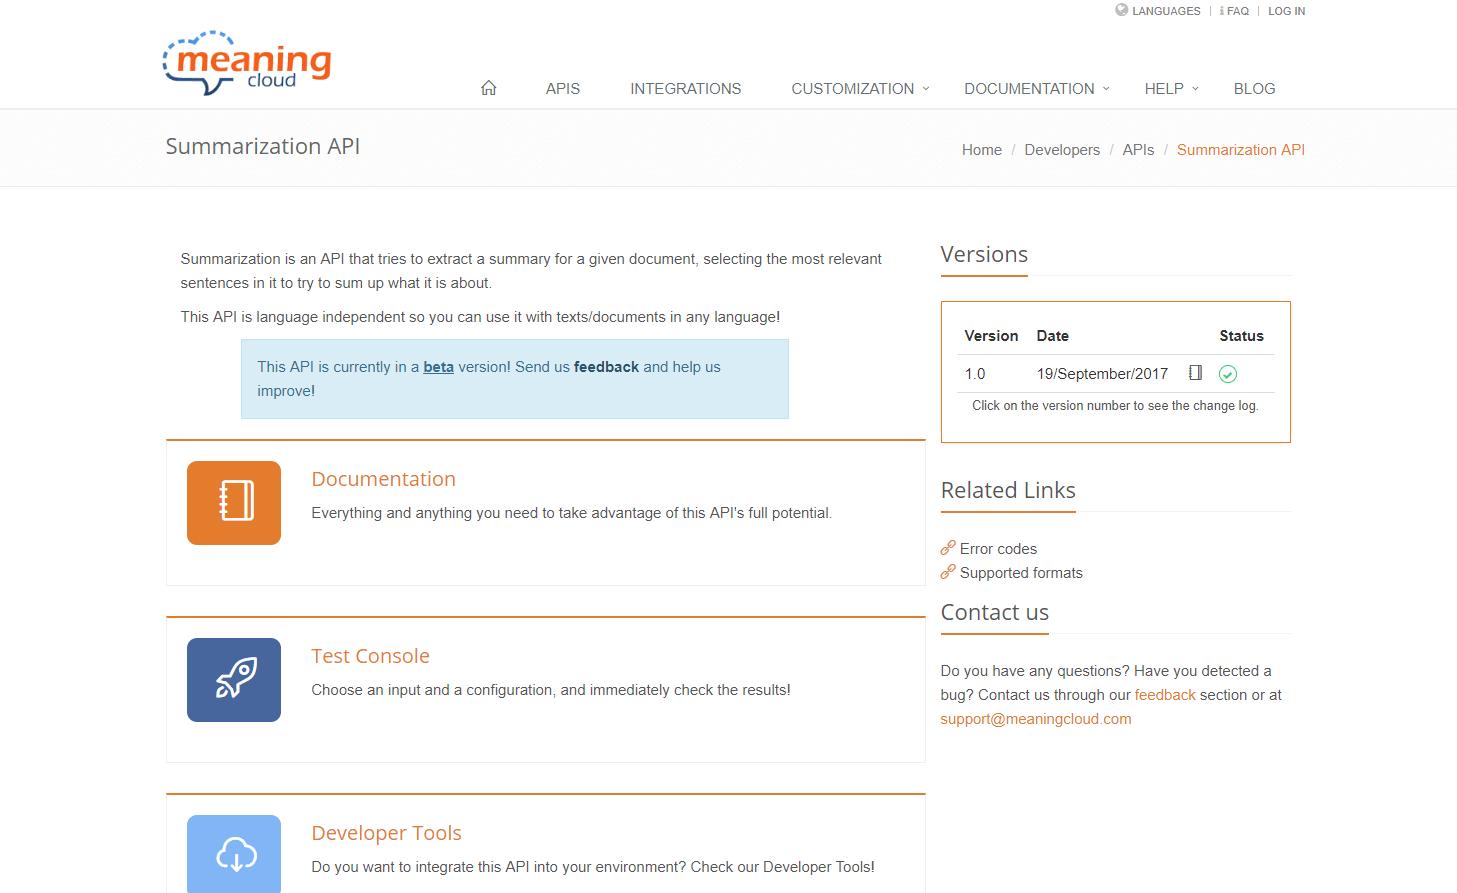 MeaningCloud Summarization API